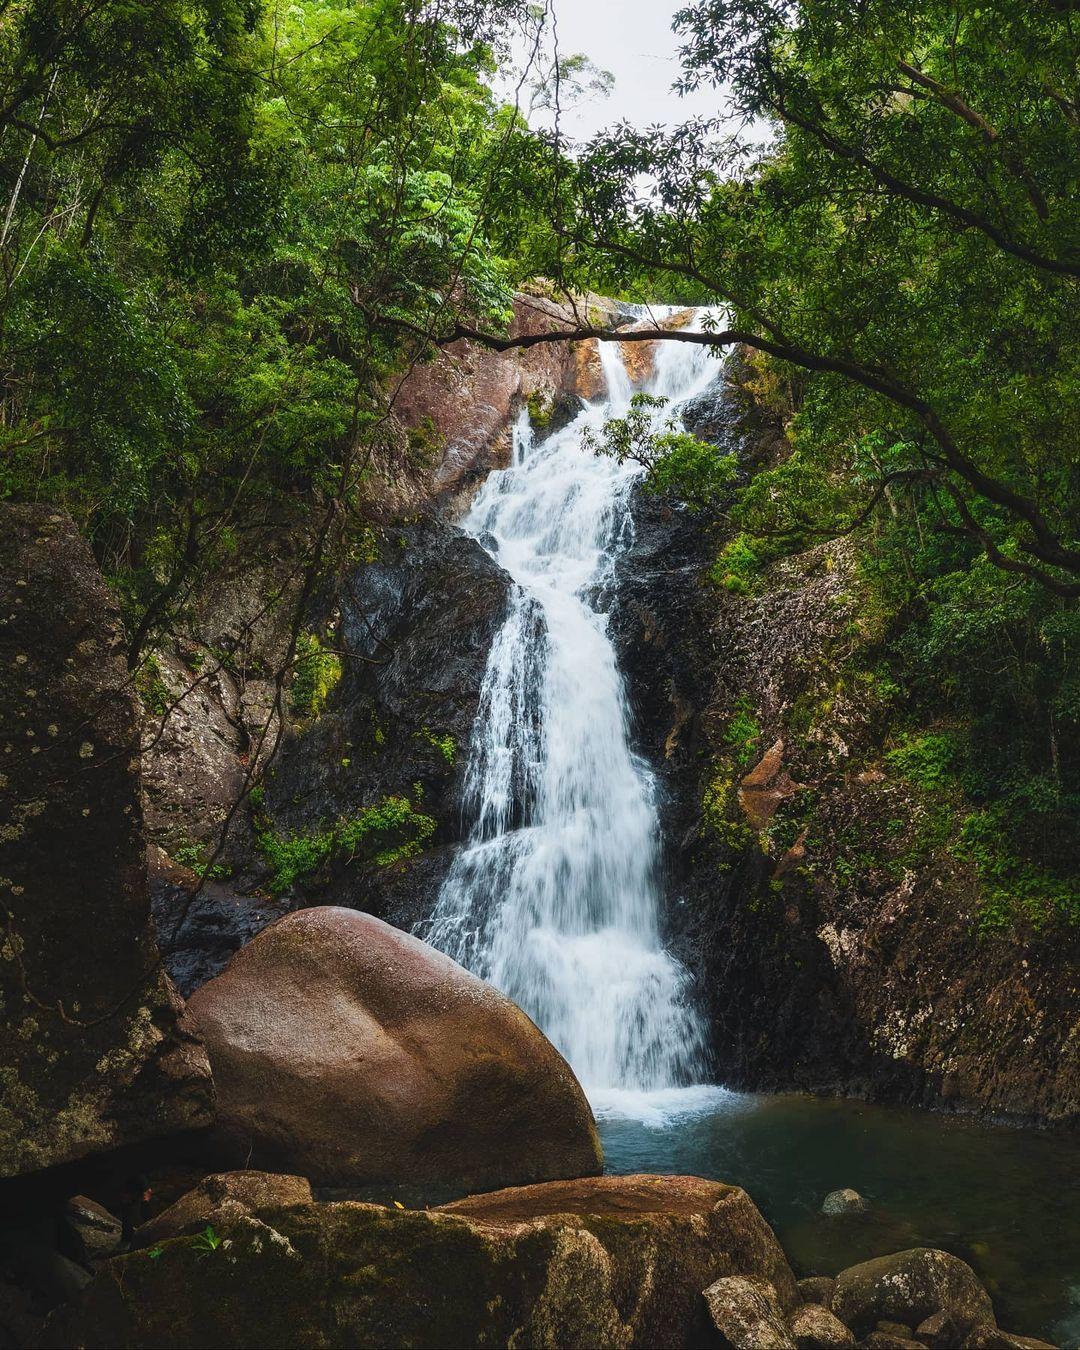 false falls reubennutt